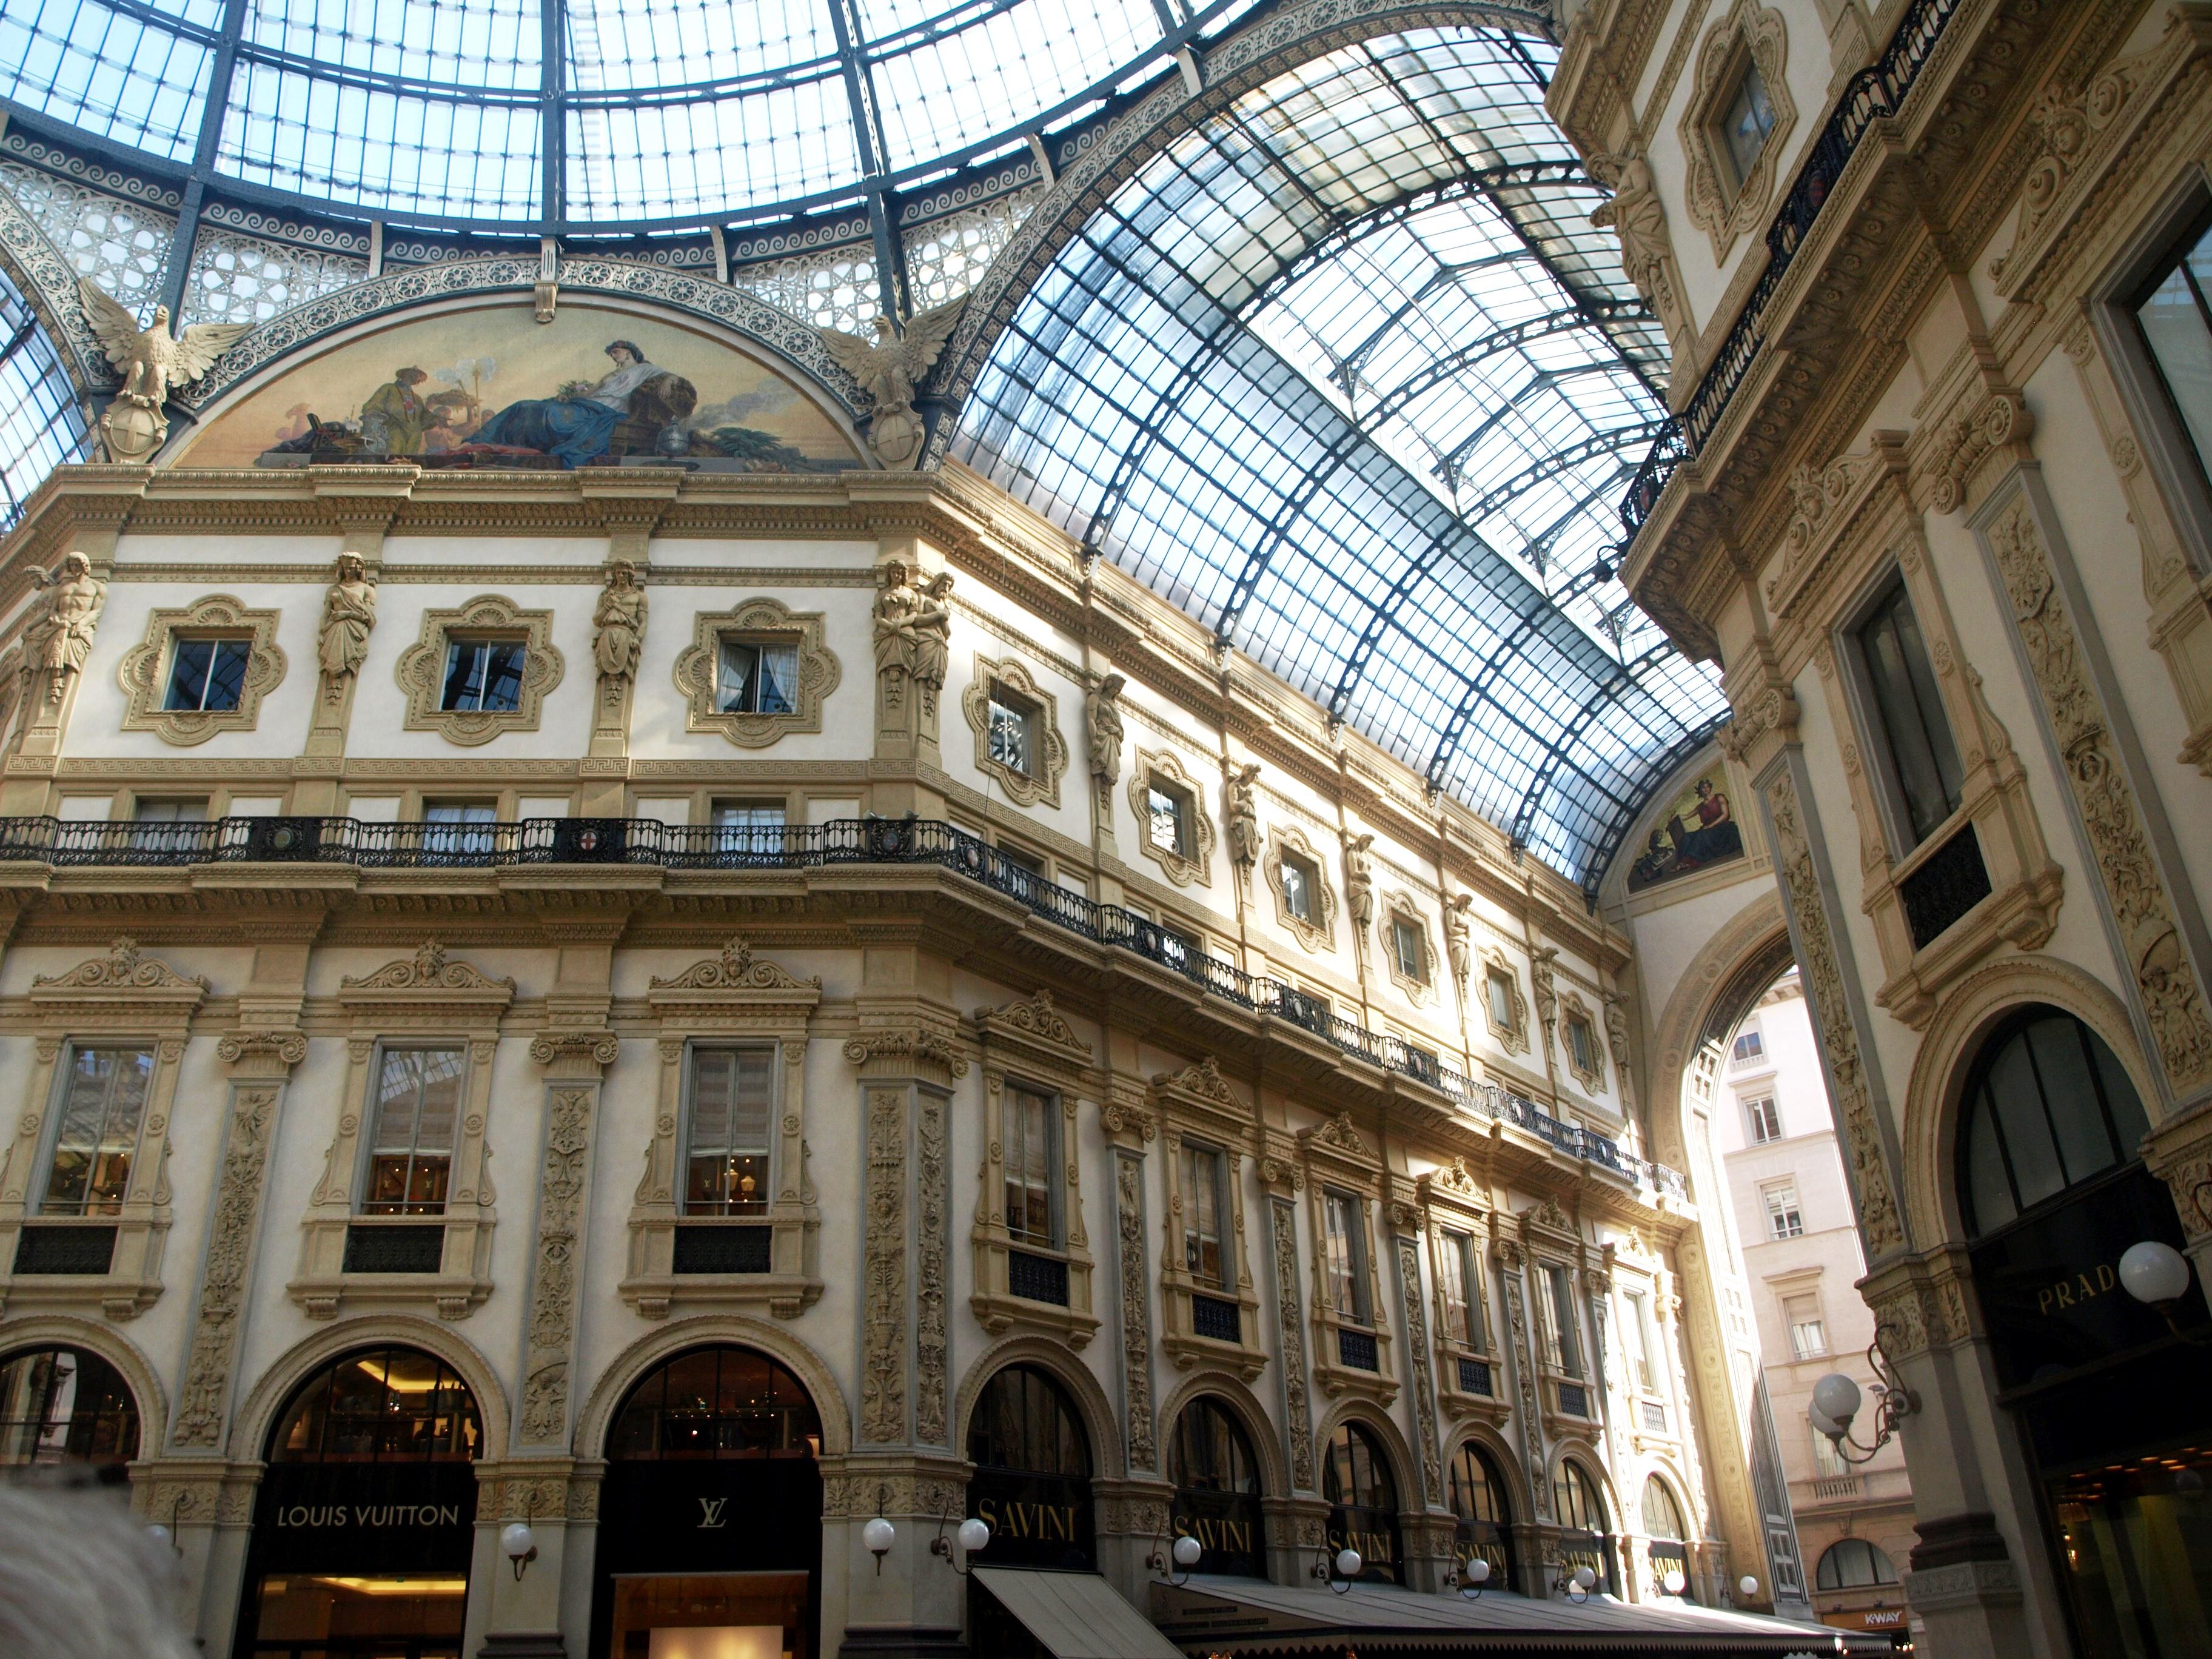 Itálie - Milán - Galleria Vittorio Emanuelle II, neorenesanční, 1865-76